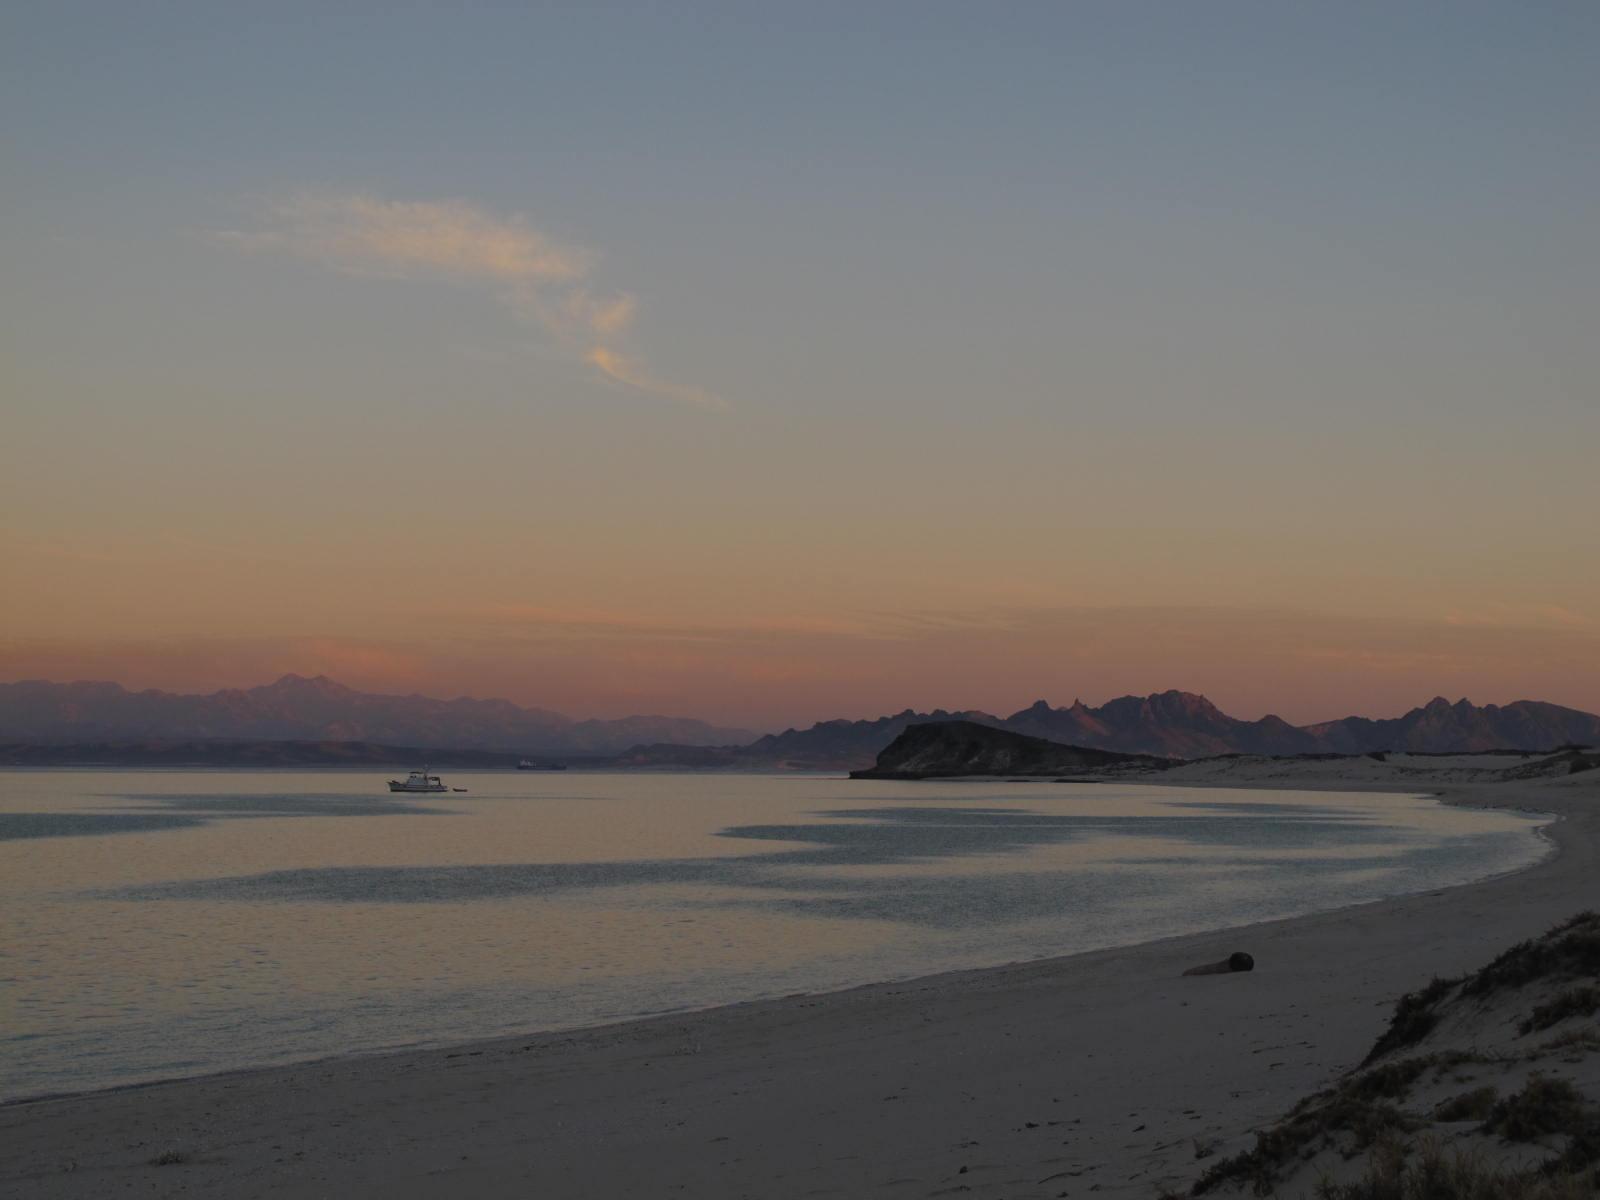 Beach at sunset: Playa La Bonanza, Isla Espíritu Santo, Baja California